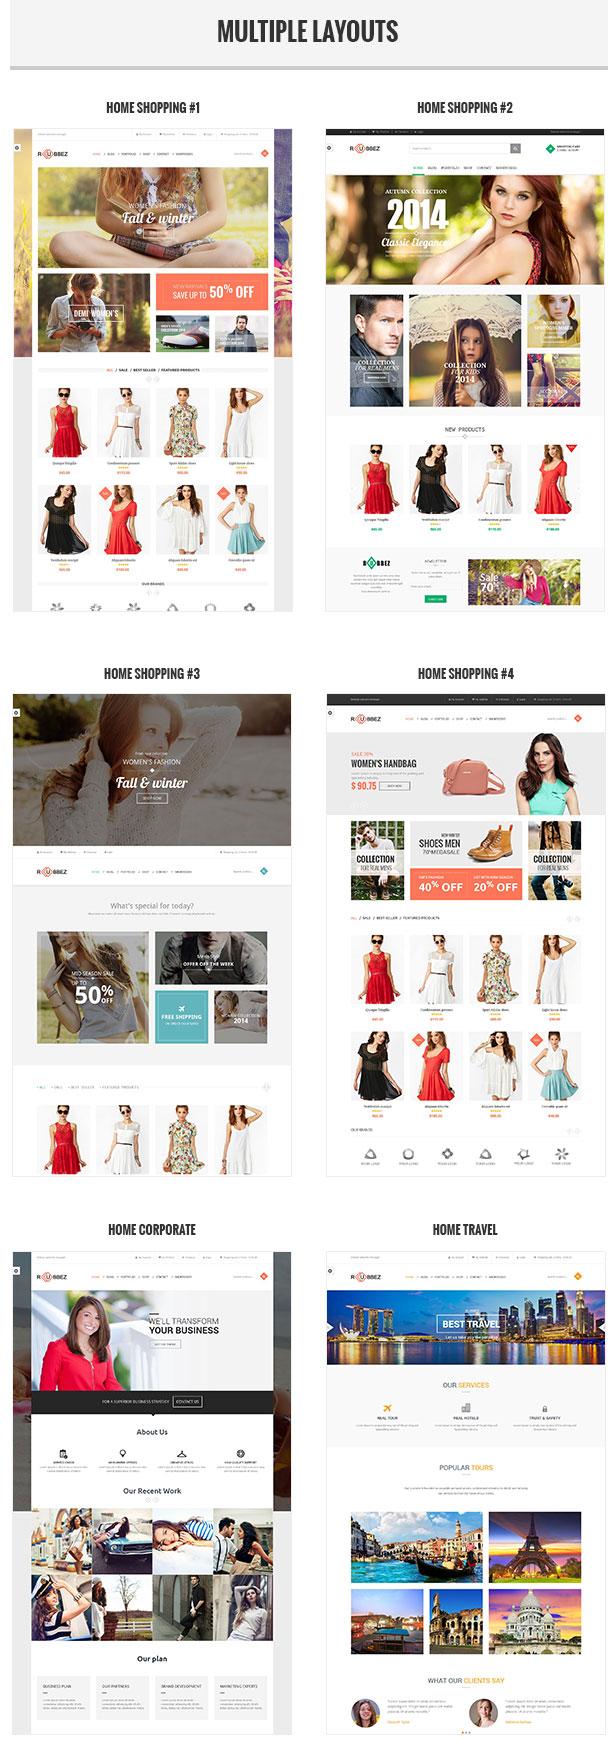 Rubbez- WooCommerce & Corporate WordPress Theme - 2